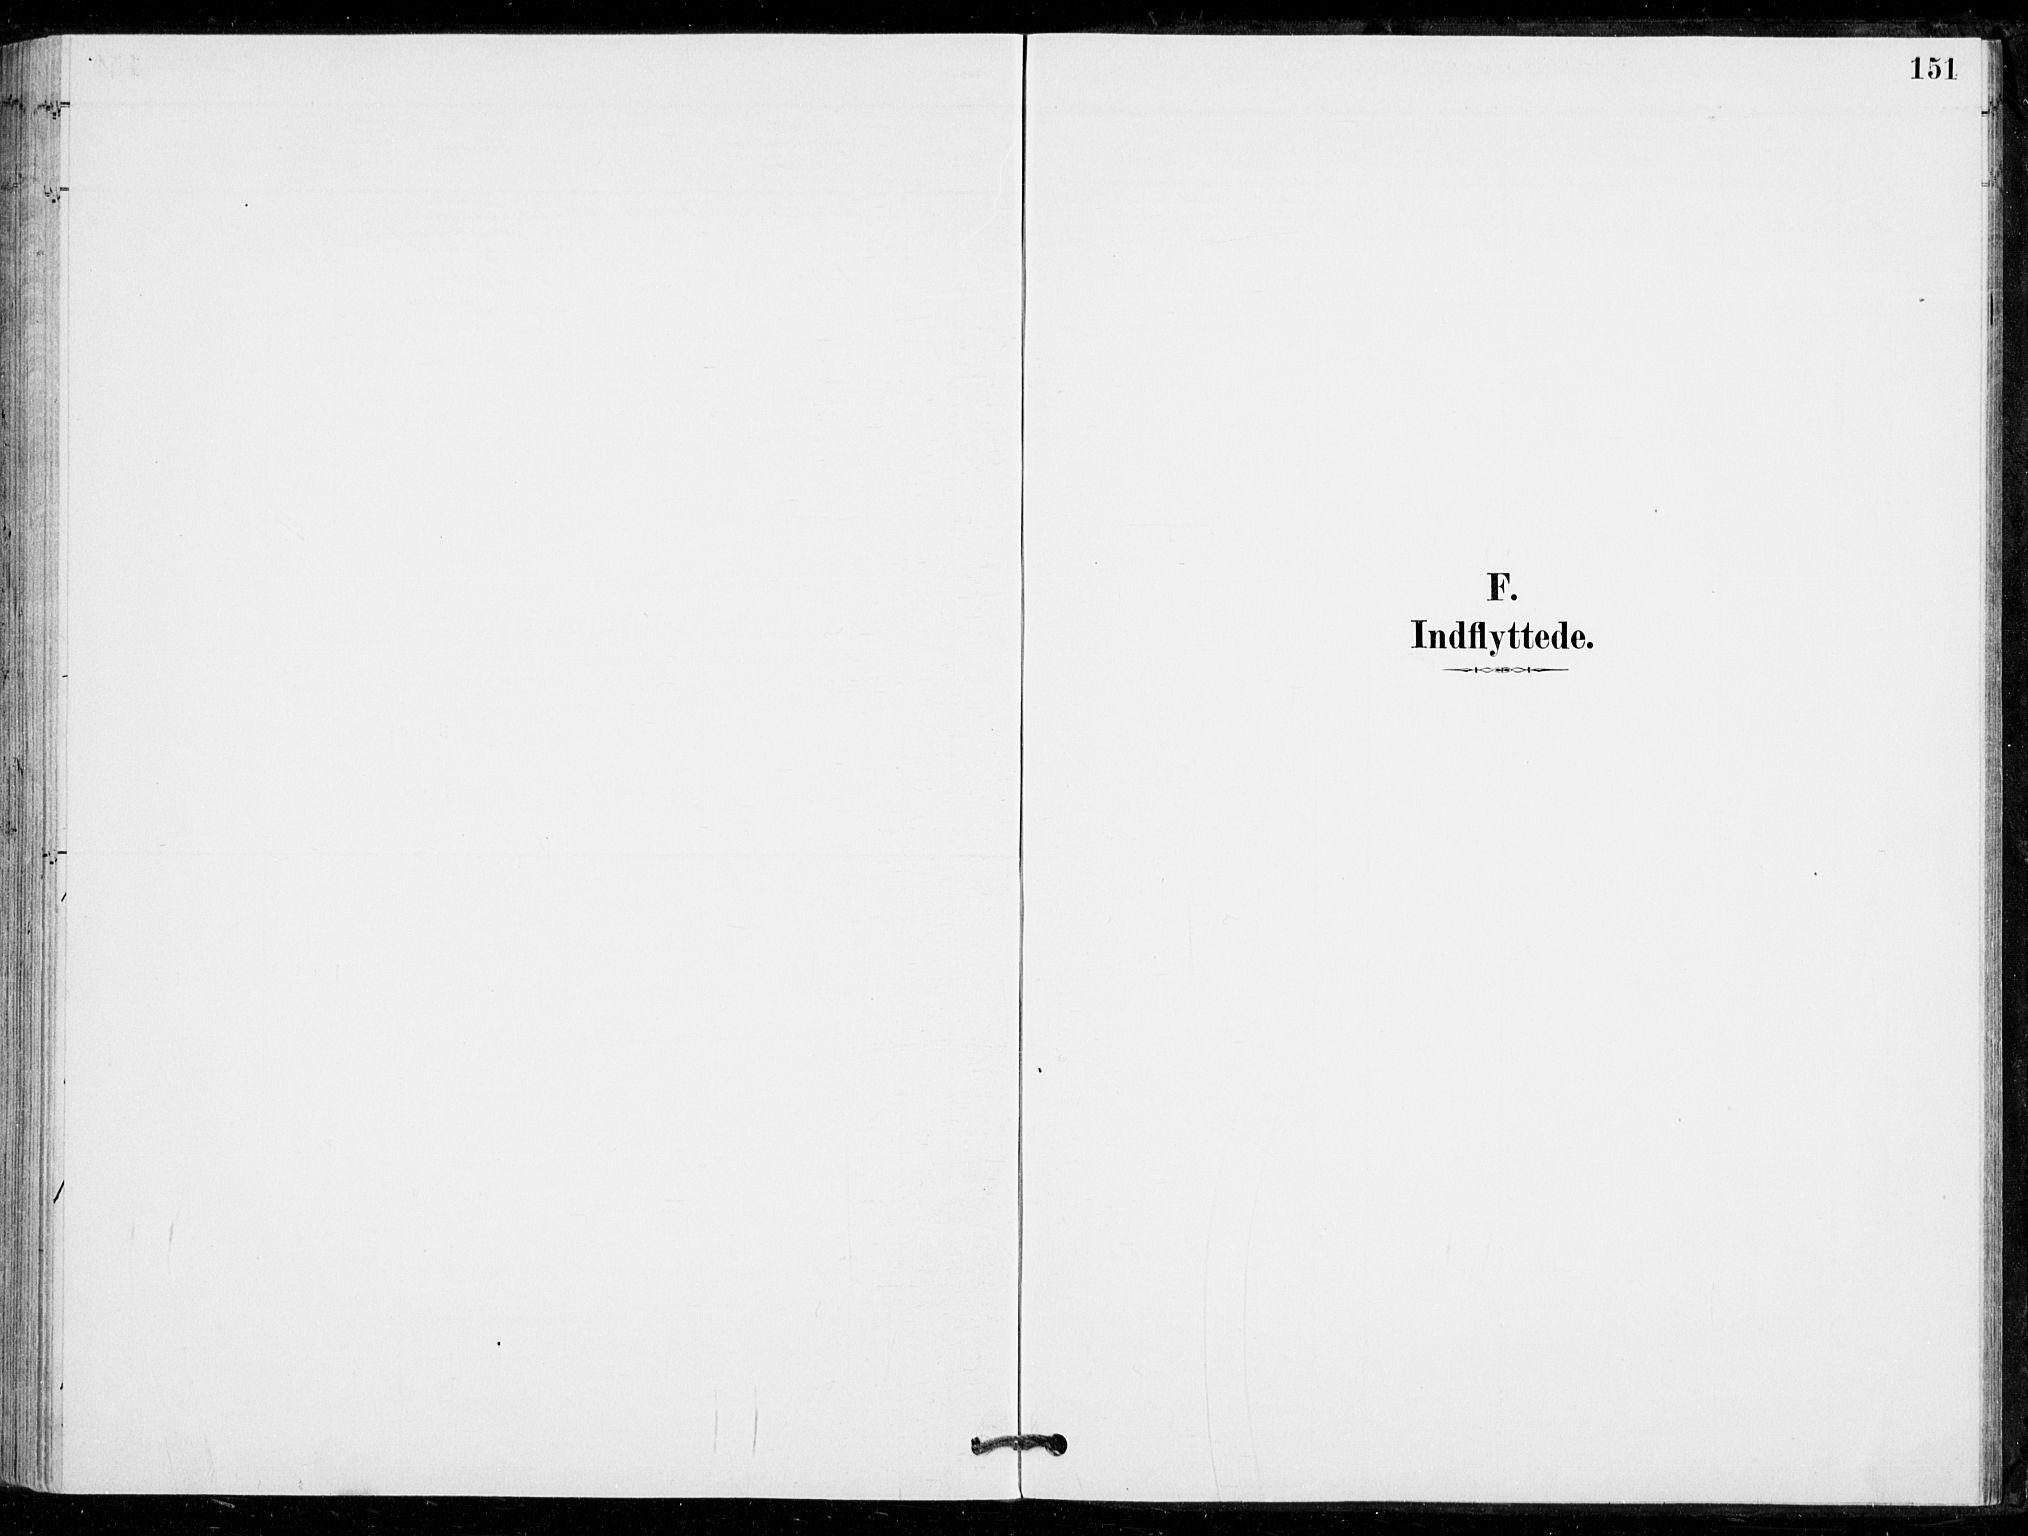 SAKO, Nore kirkebøker, G/Gc/L0003: Klokkerbok nr. III 3, 1881-1941, s. 151